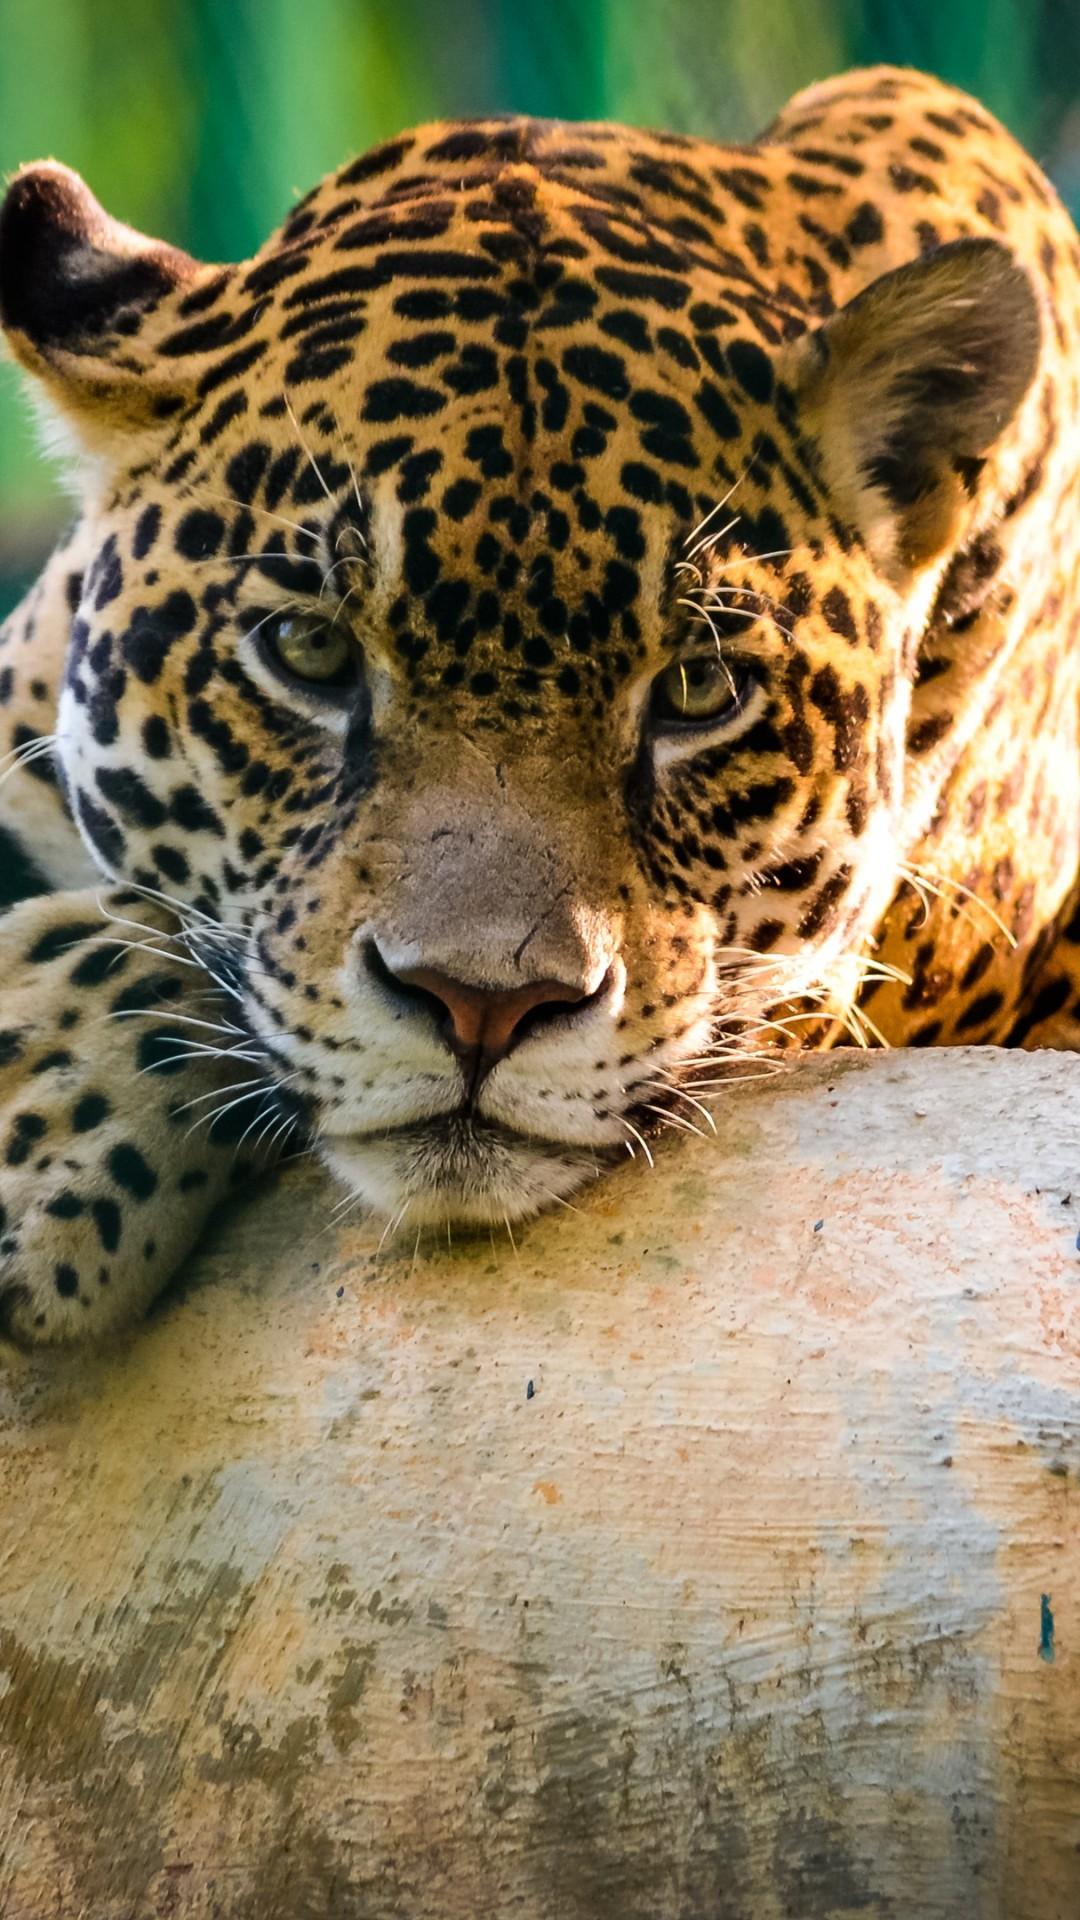 Tiger Animal Wallpaper Wallpaper Jaguar Wild Cat Sad Face Animals 10303